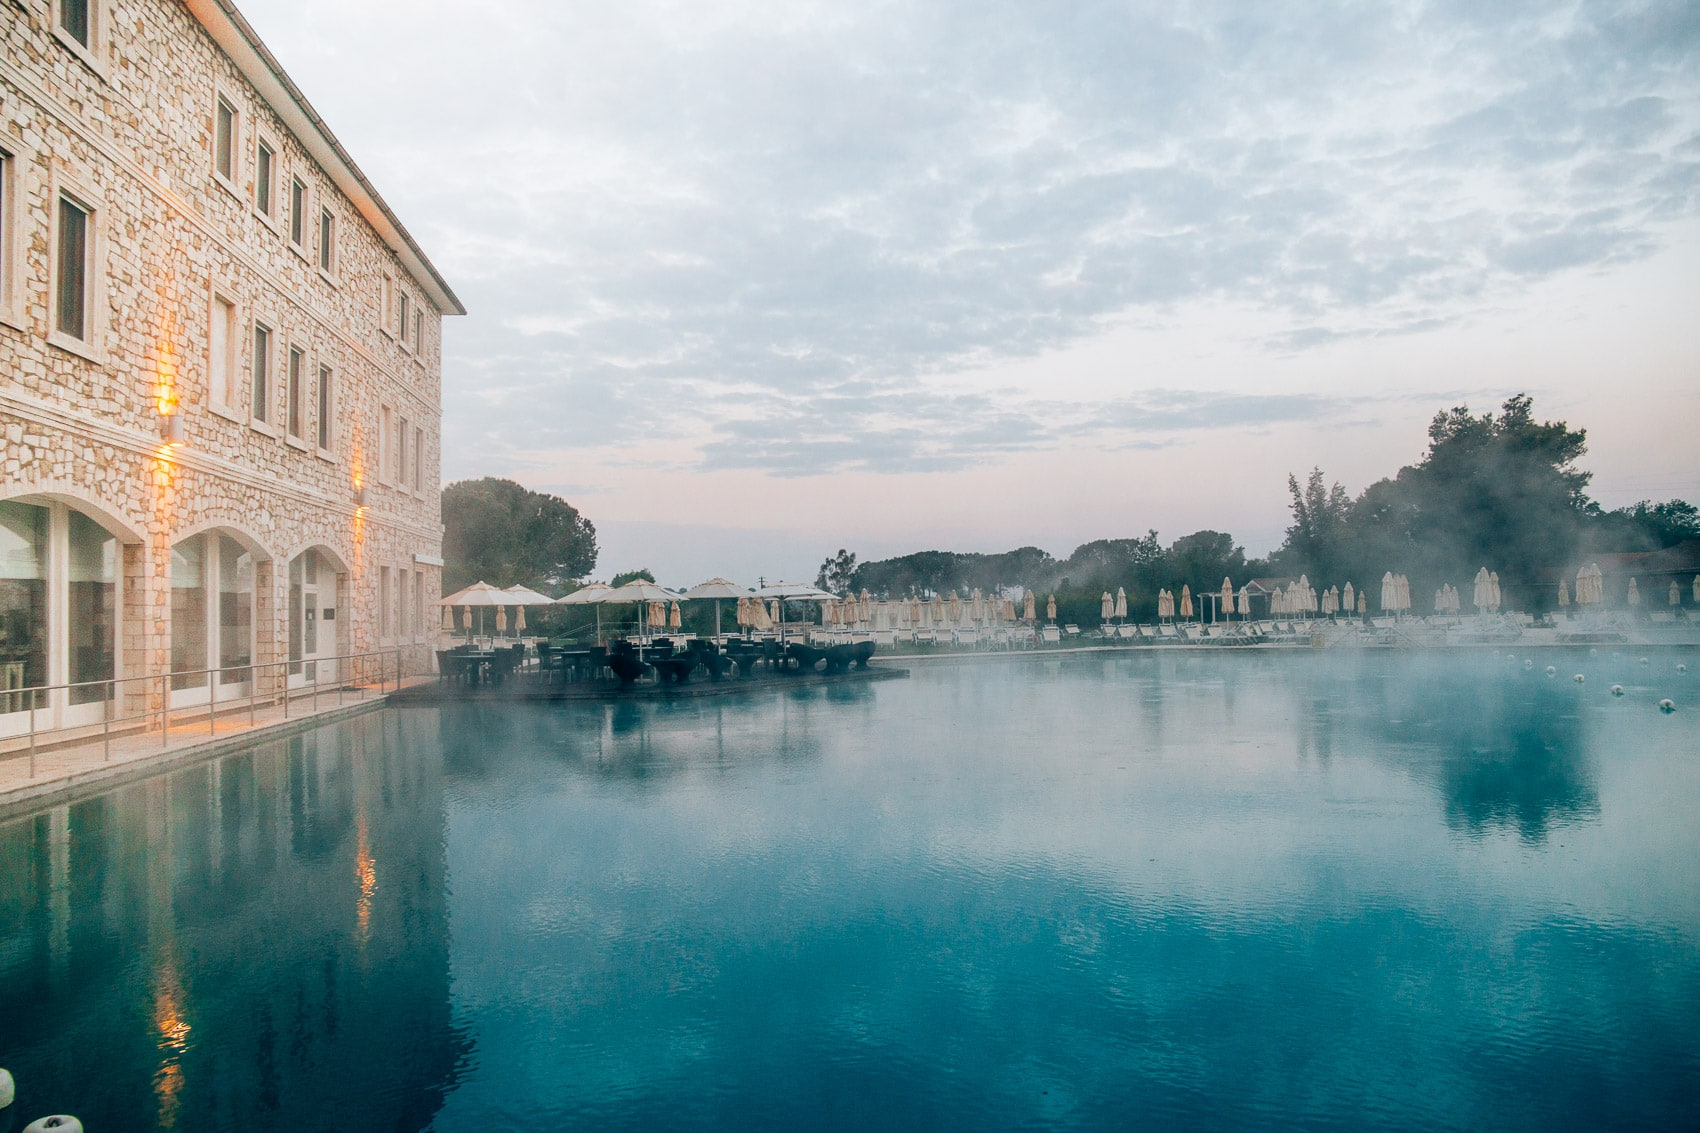 Entdecke die südliche Toskana - Italien Reisetipps Terme di Saturnia Spa & Golf Hotel